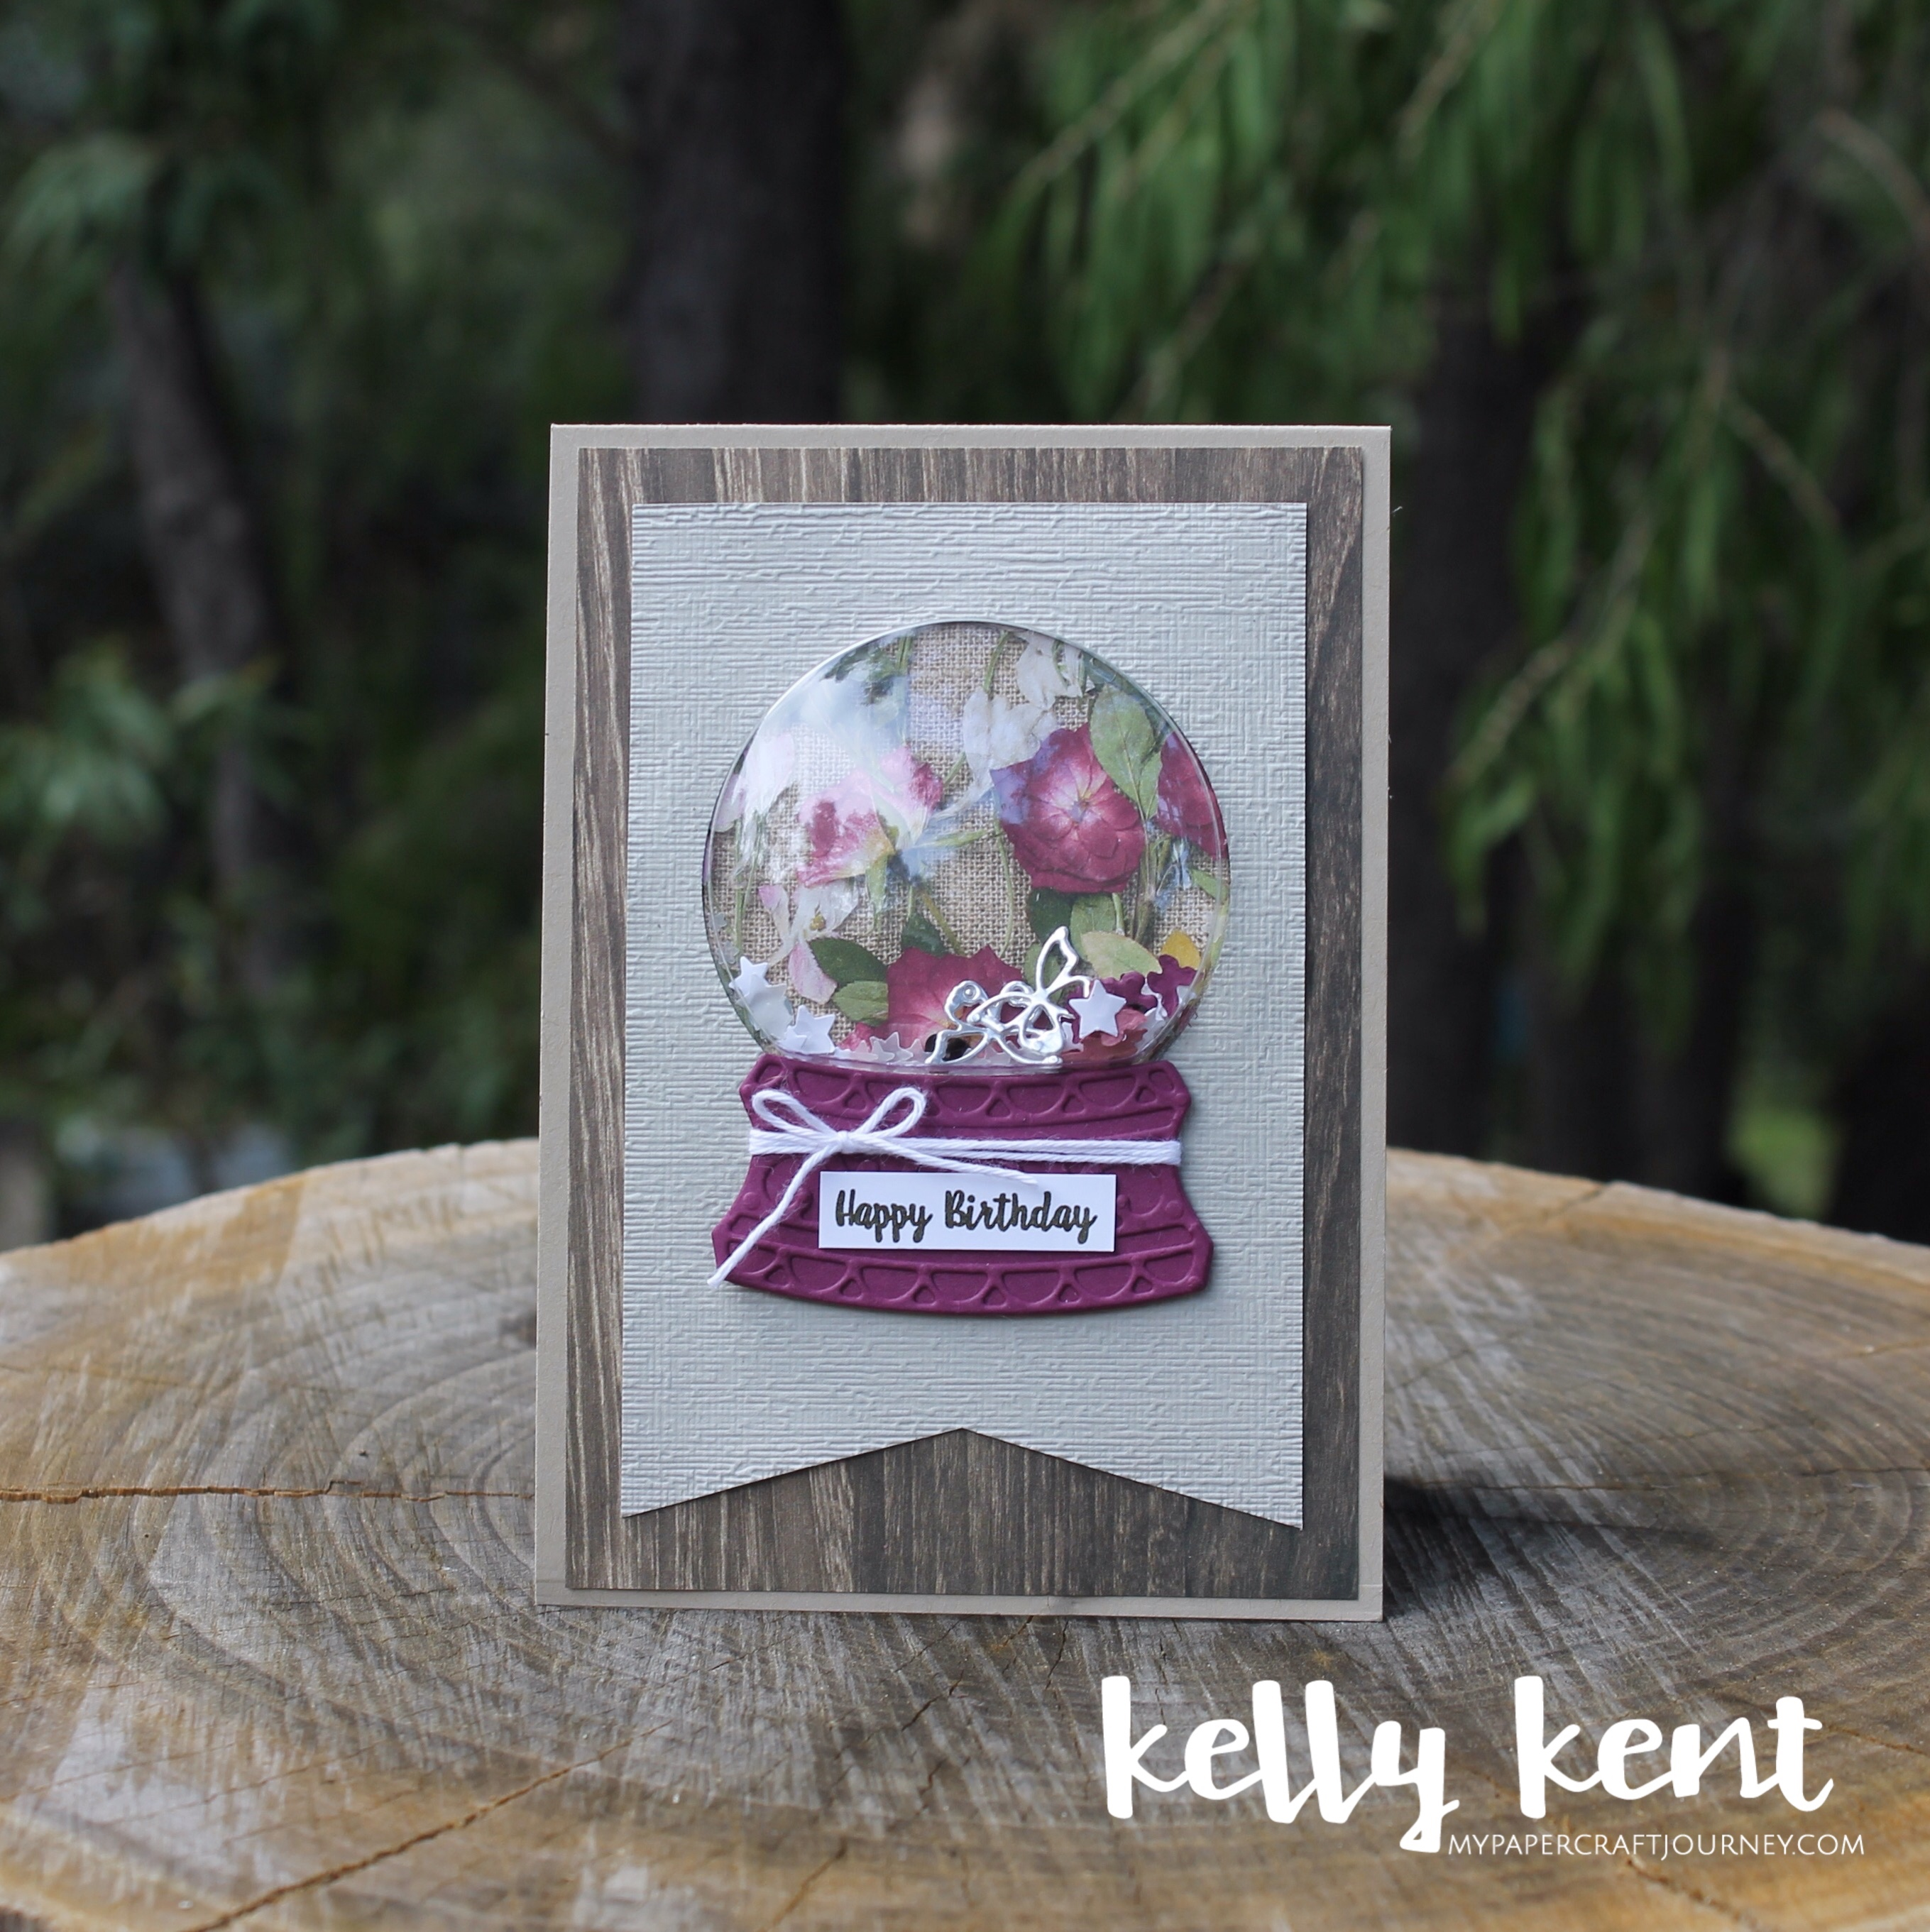 Pressed Petals Snow Globe | kelly kent